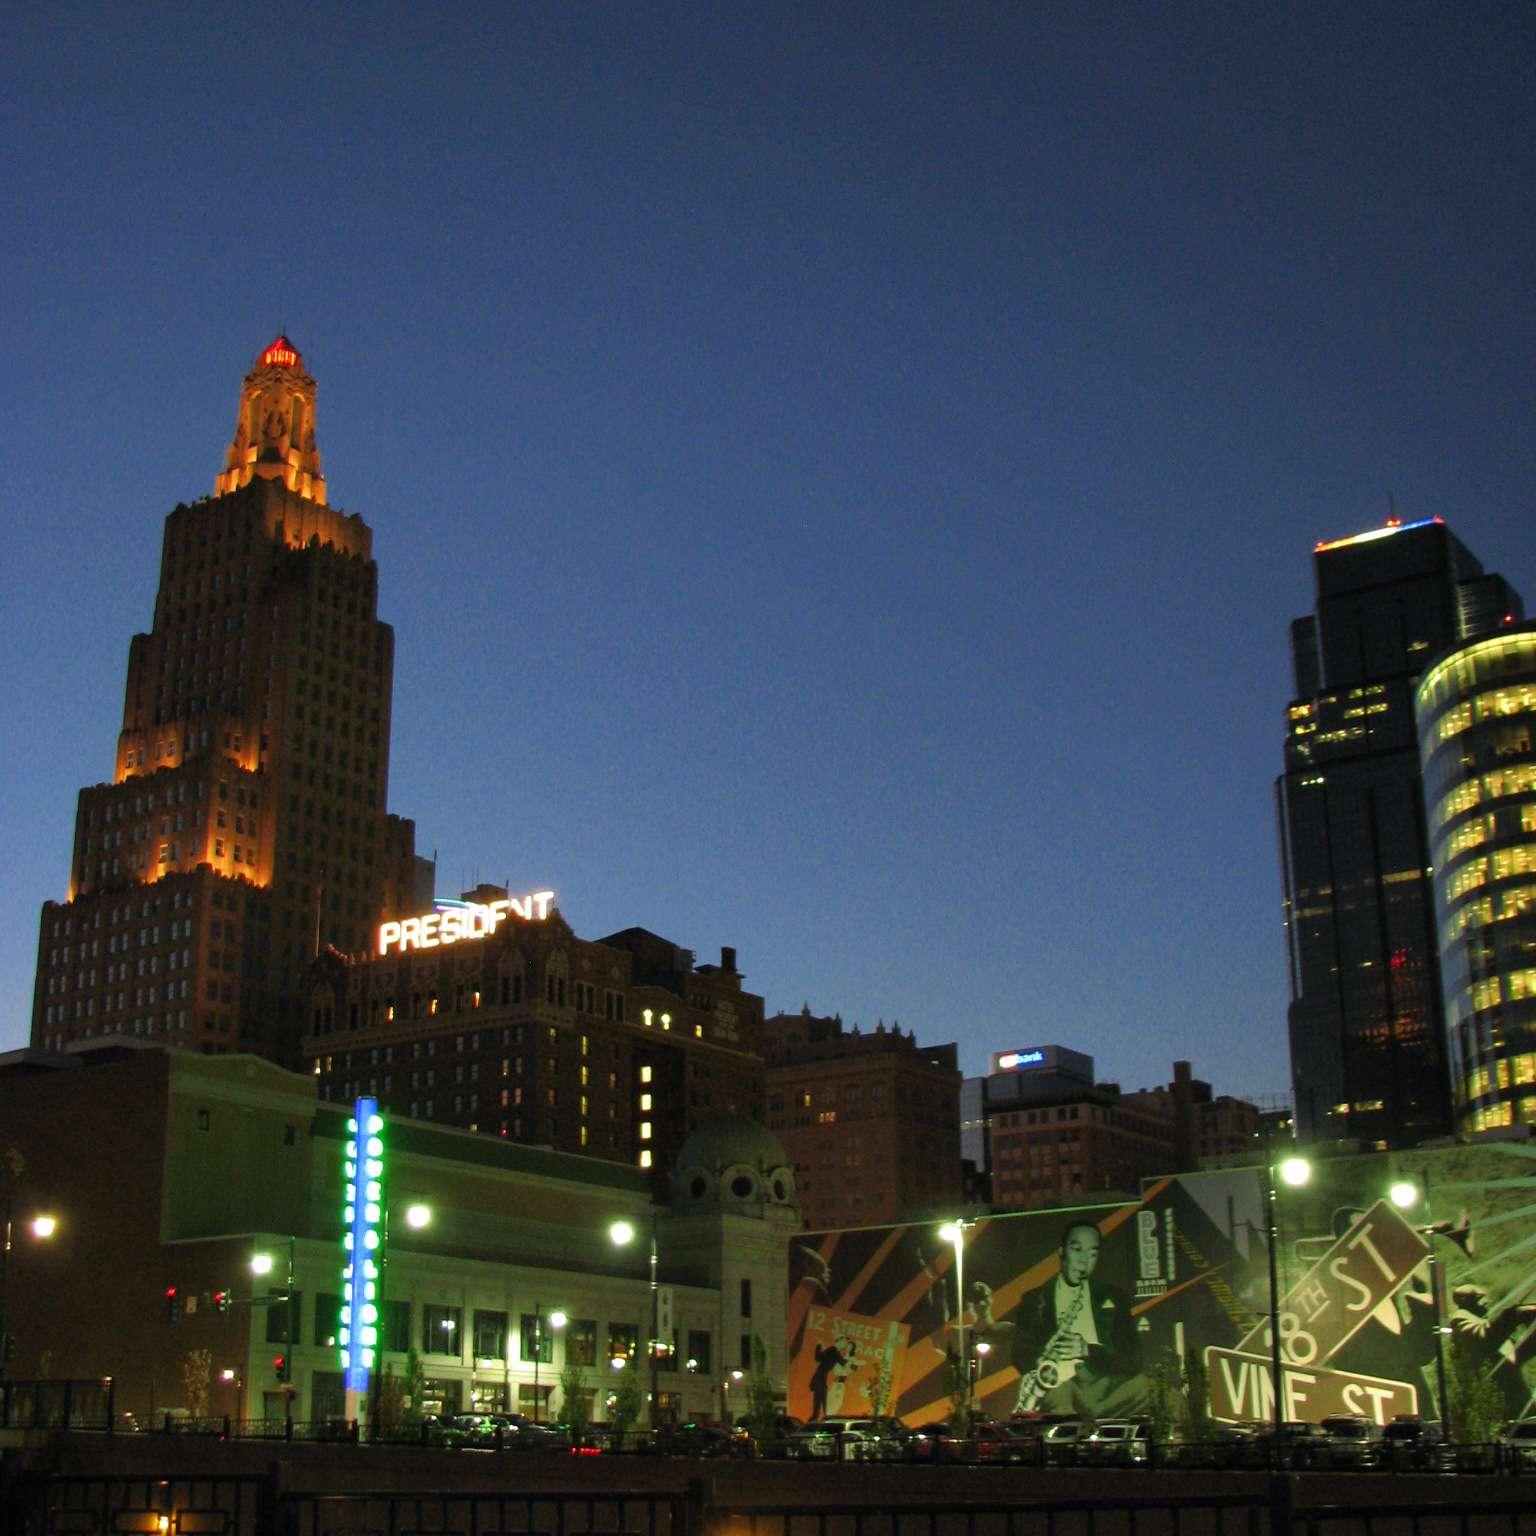 Kansas City at night